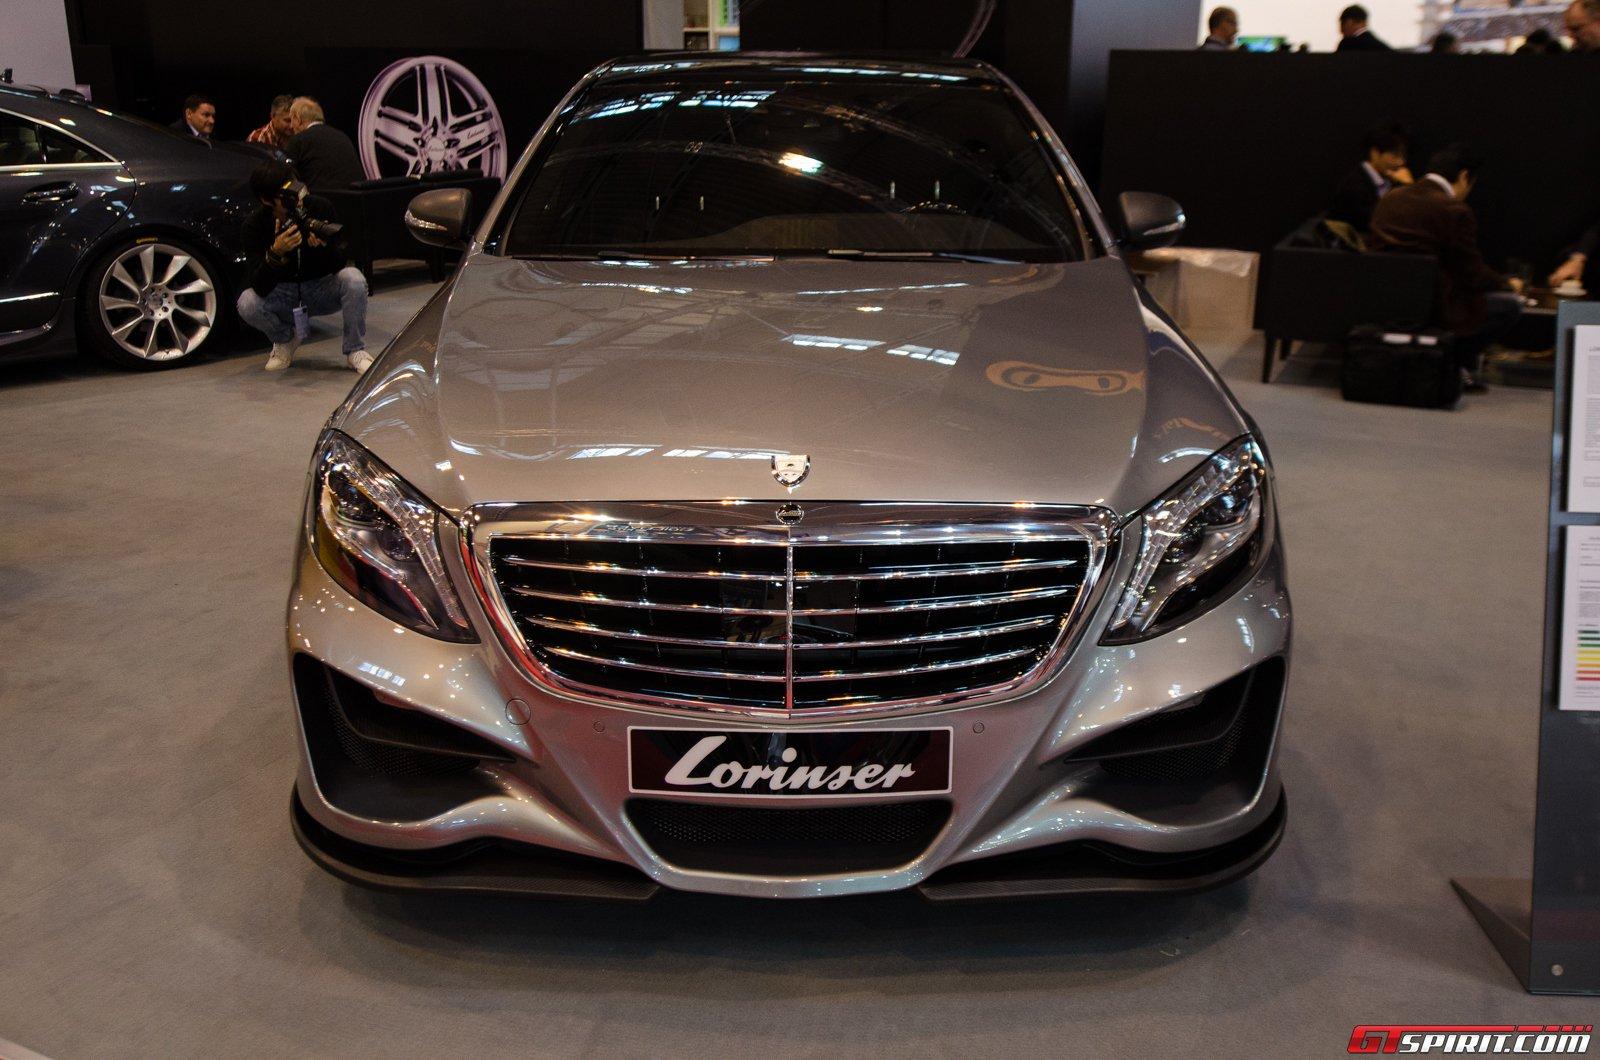 Check Out the Lorinser Mercedes-Benz S500 at Essen - BenzInsider.com ...